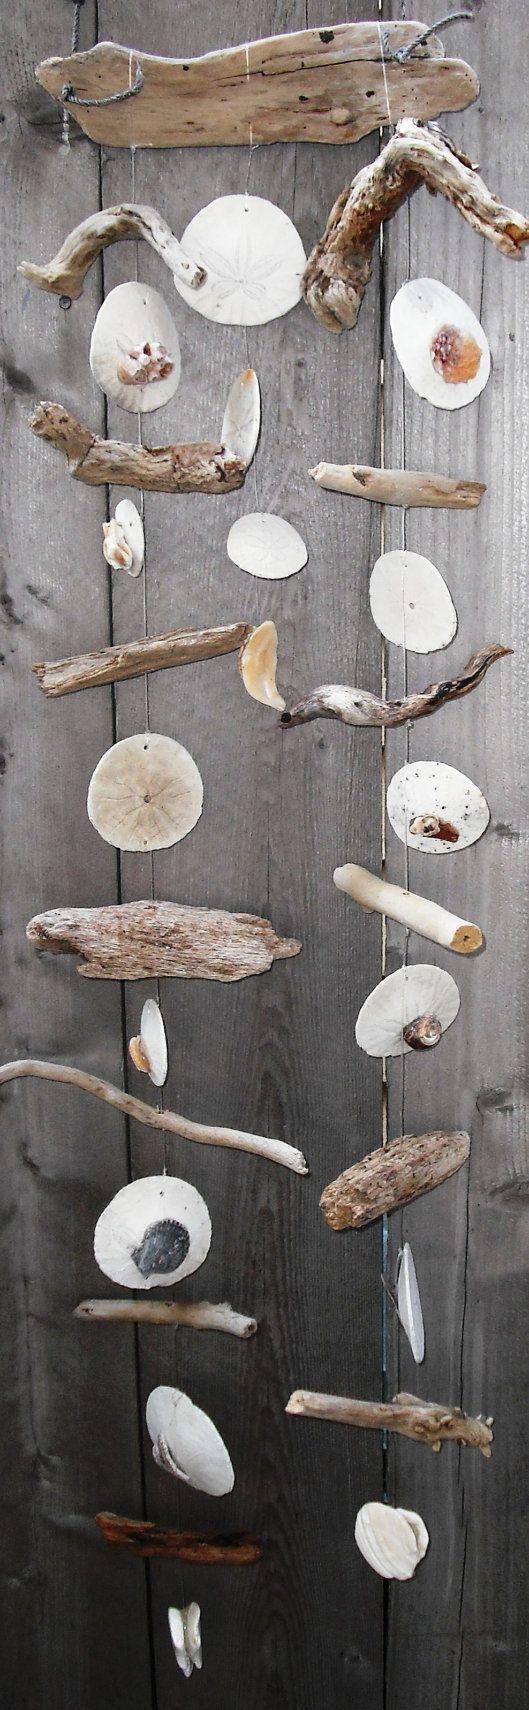 driftwood, sand dollar, and seashells